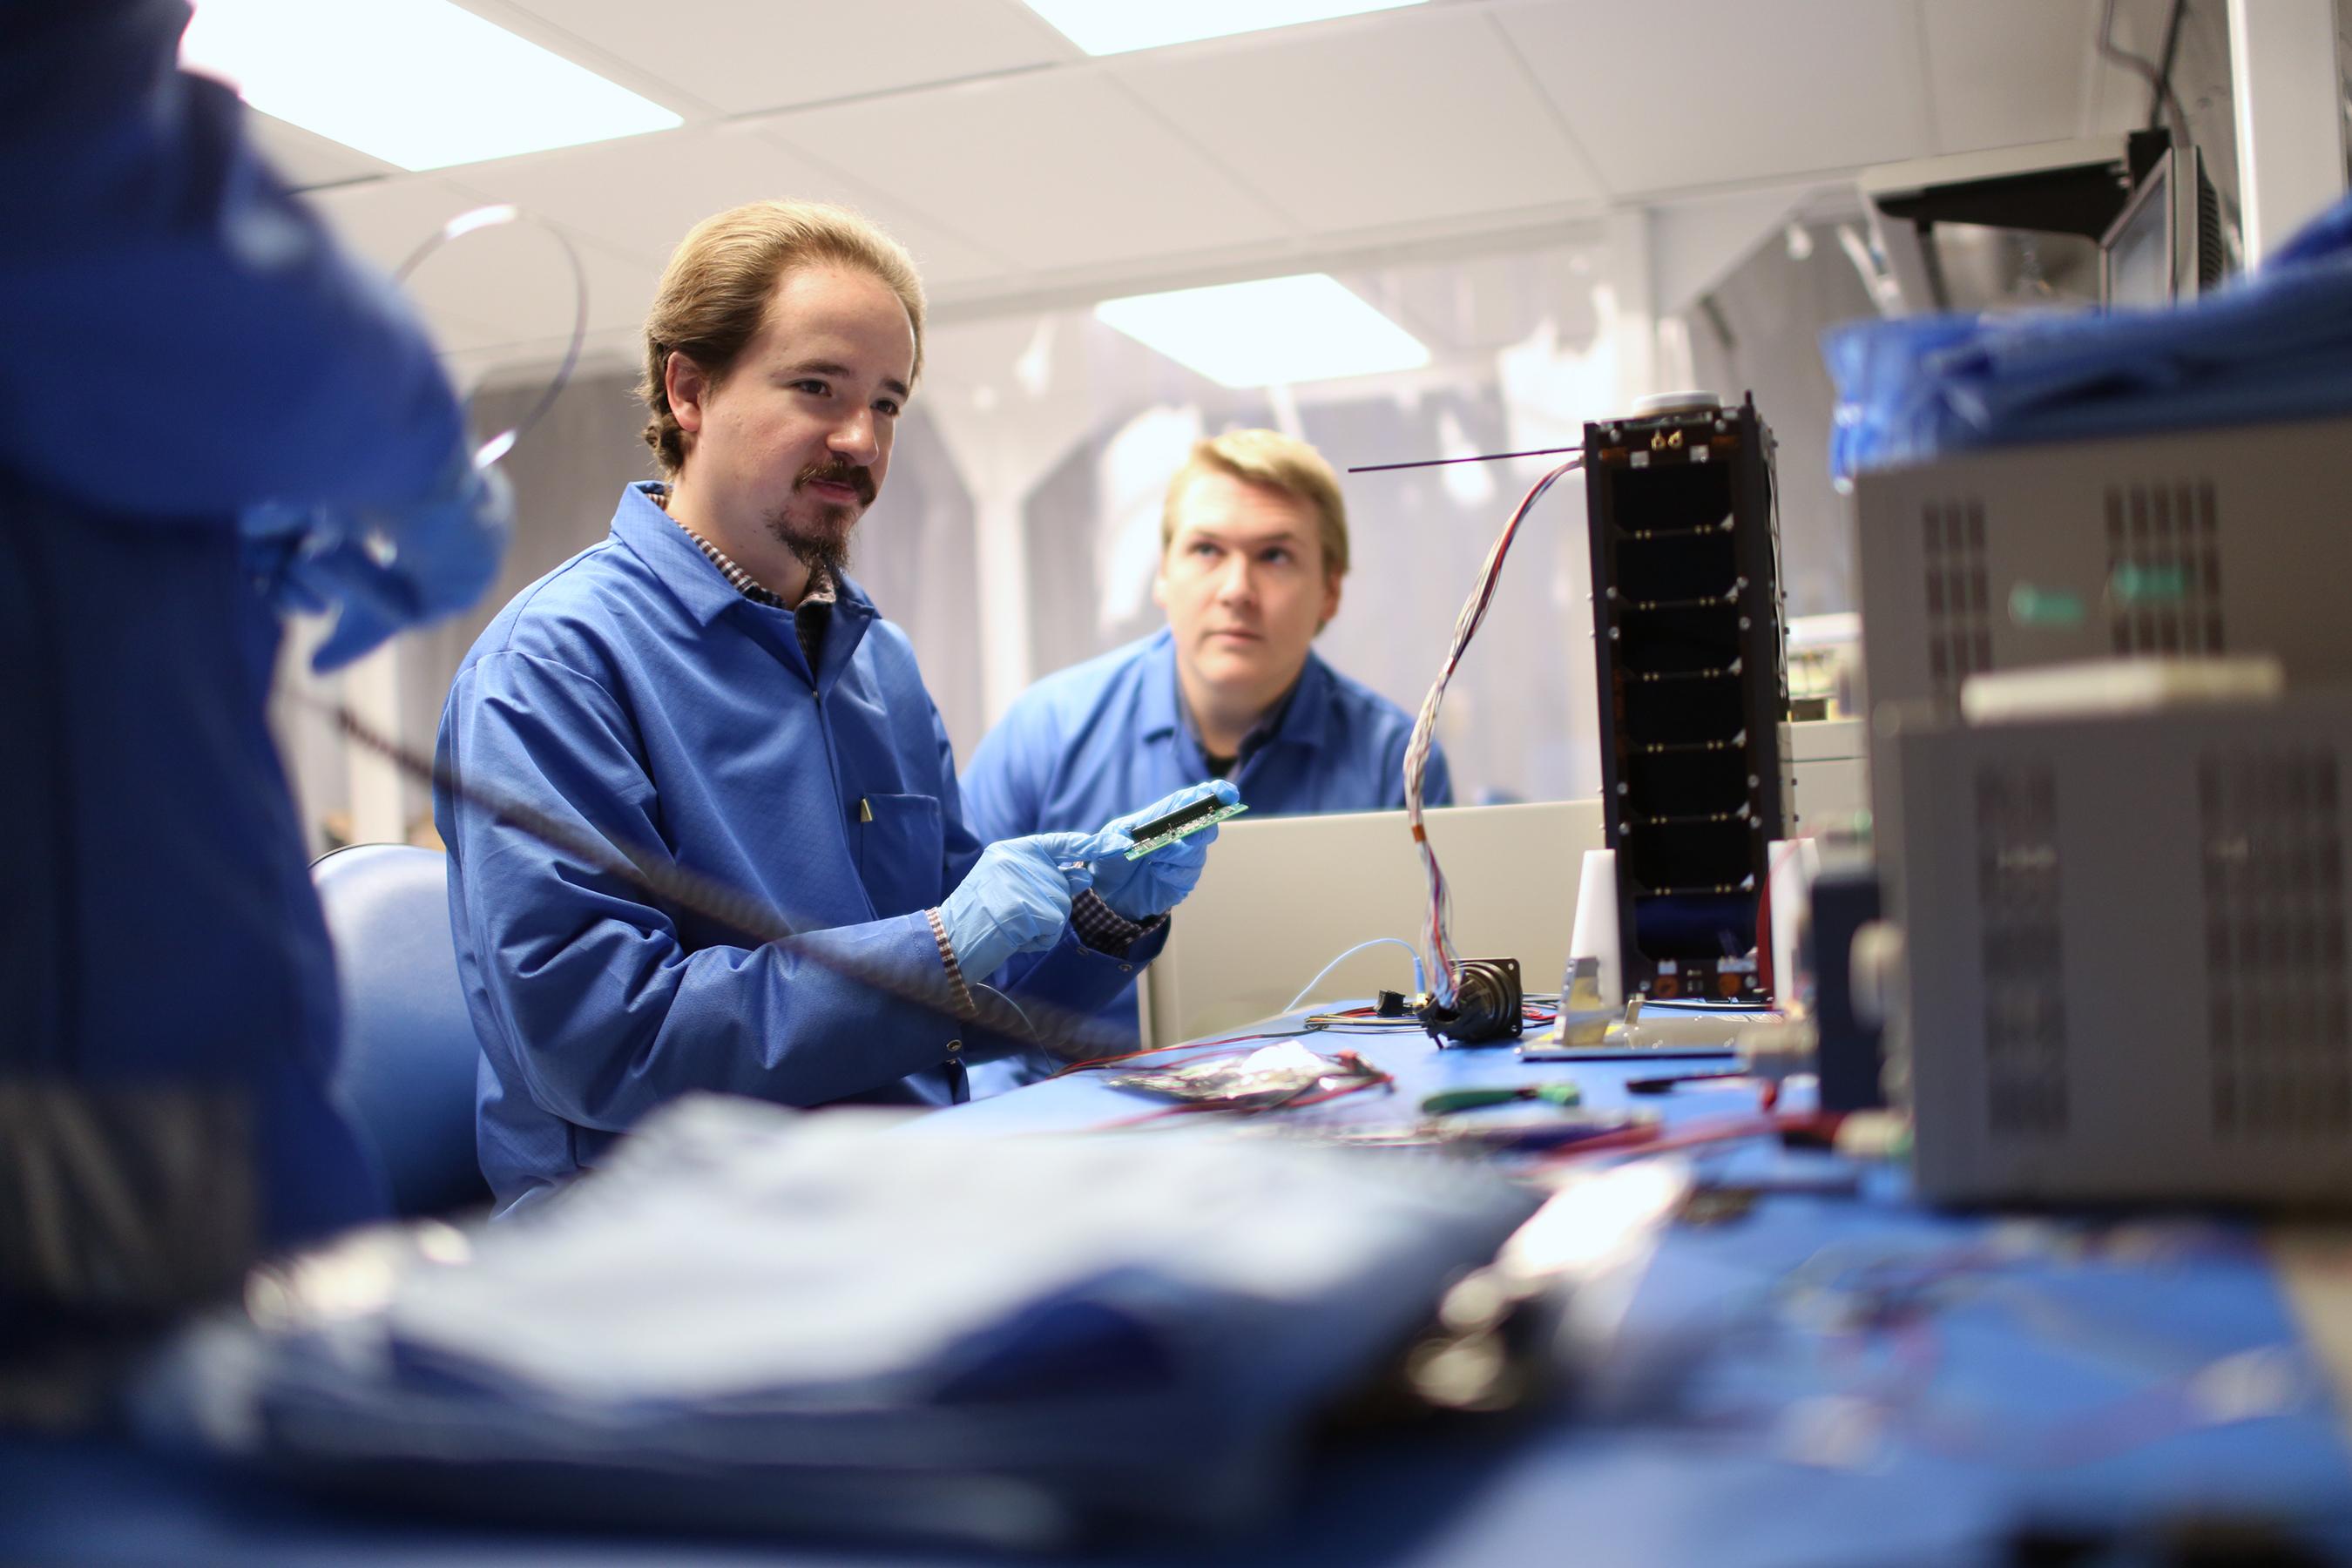 Men dressed in blue work in a lab